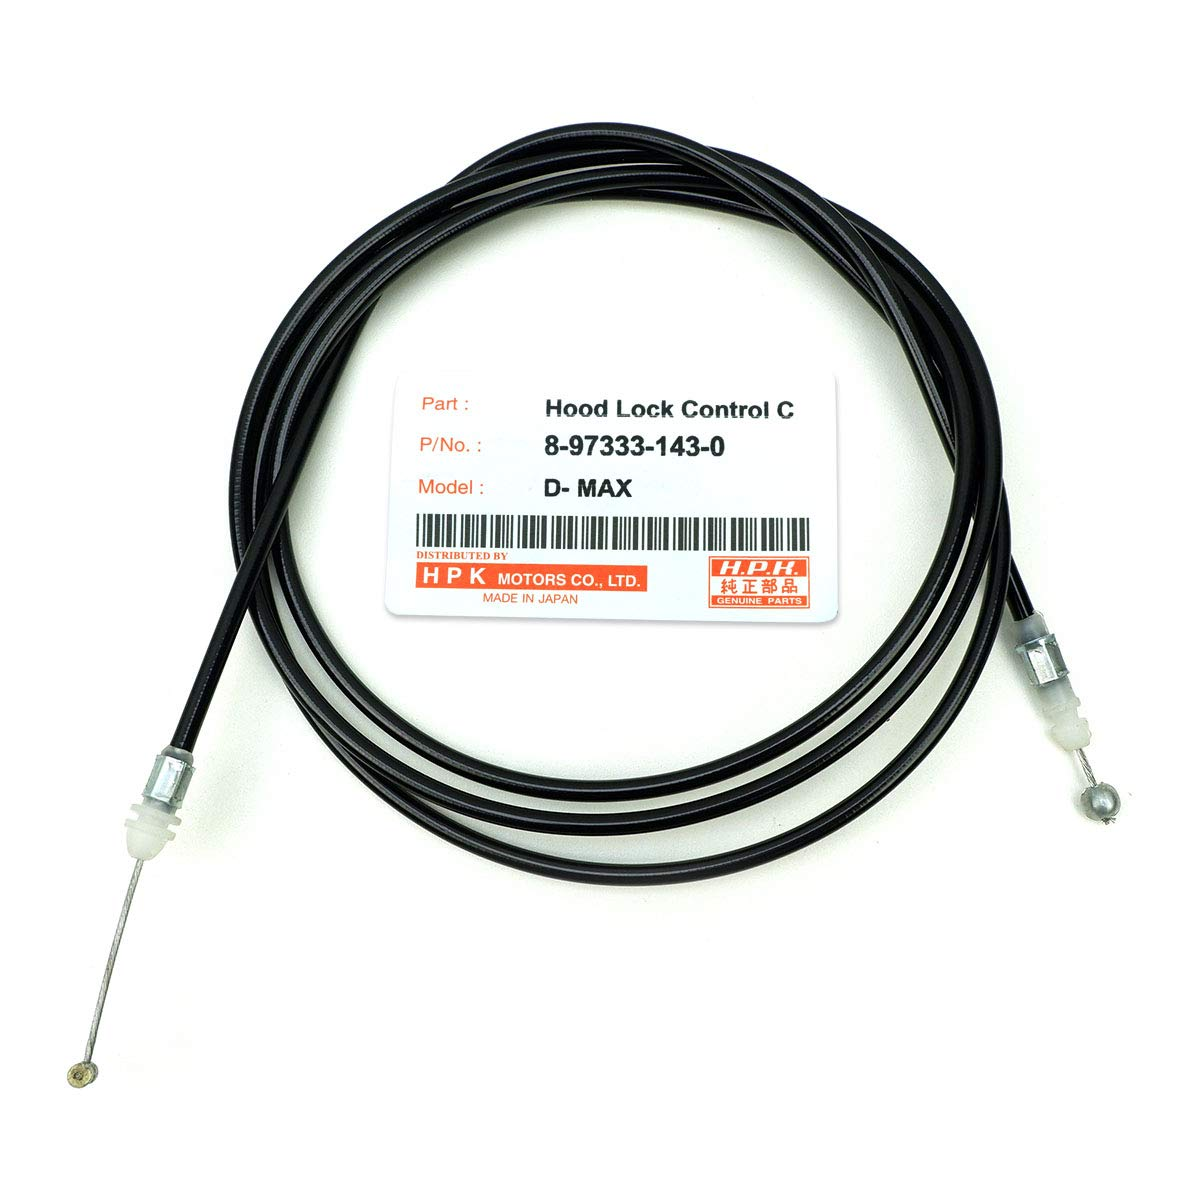 Nonstops Hood Bonnet Lock Release Control Cable Black Fits Isuzu D Max Pickup 2003 2011